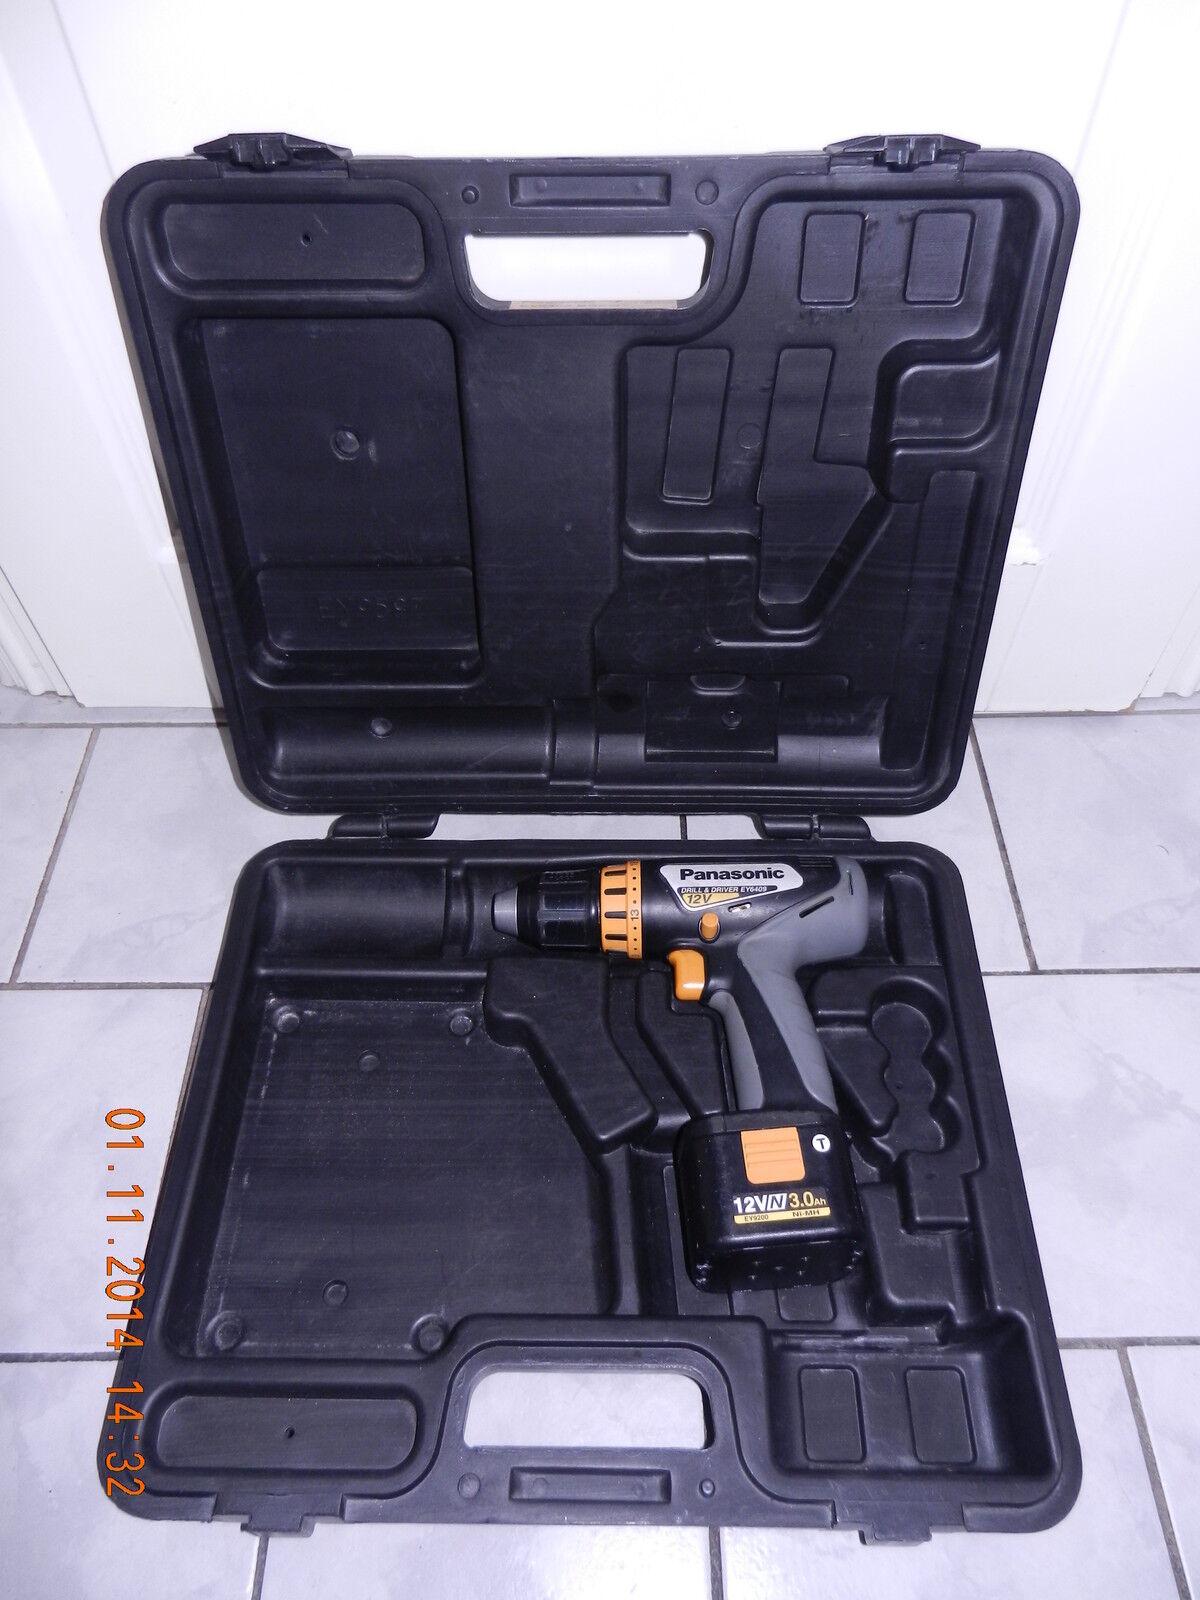 PANASONIC EY6409 GQKW 12V PROFI-Akkuschrauber aus 2005 Jahre, 100%OK+AKKU+Koffer